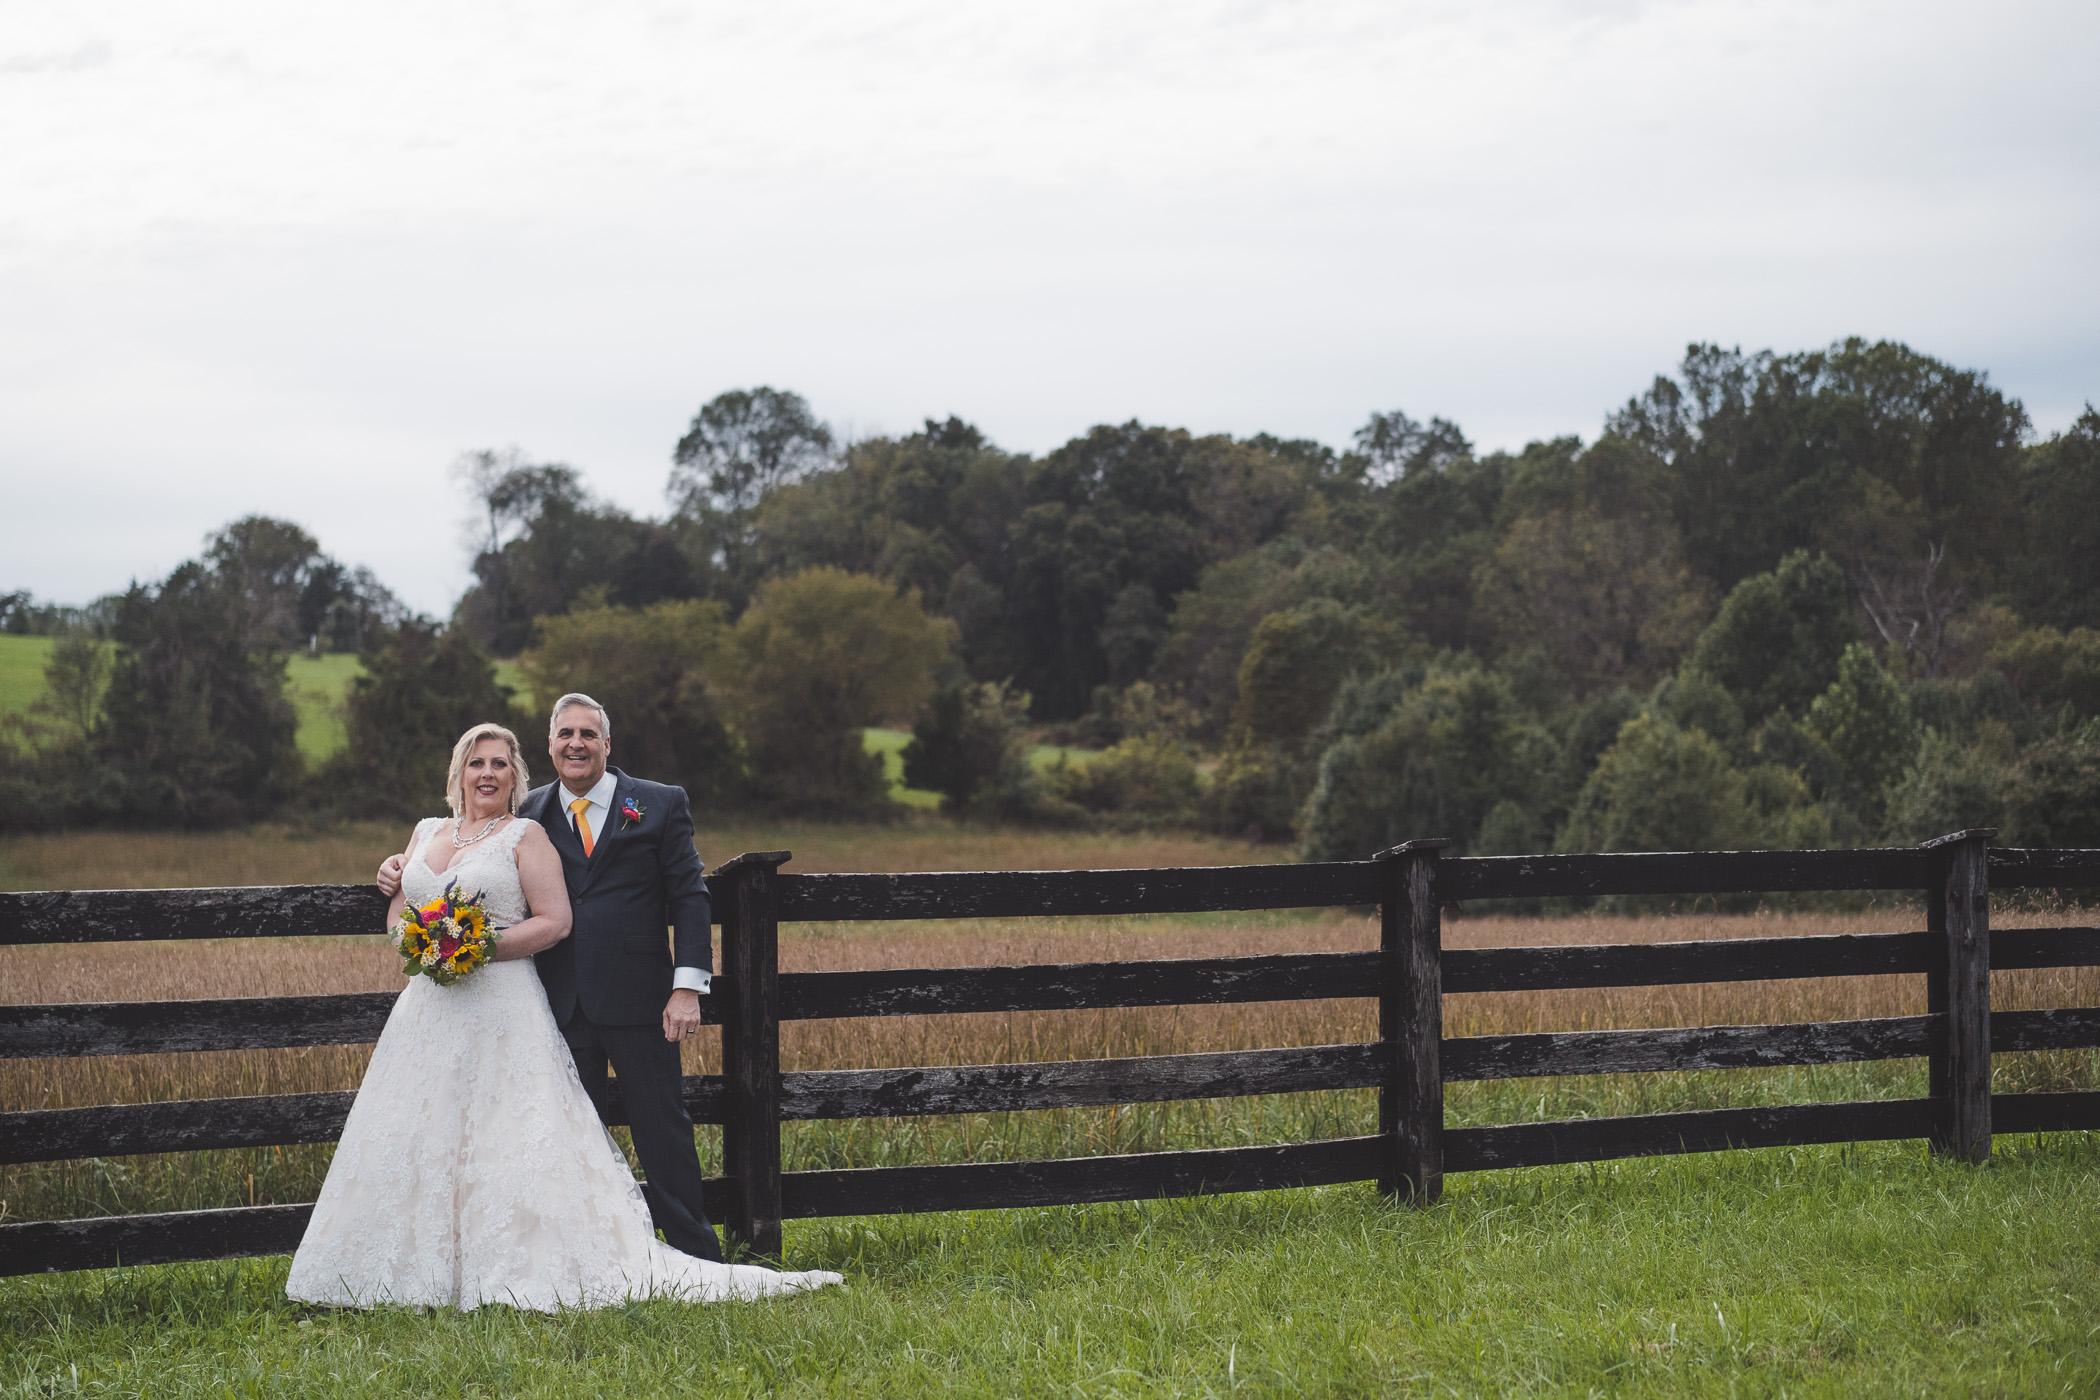 18-Faux Wedding-brandon shane warren-137.jpg